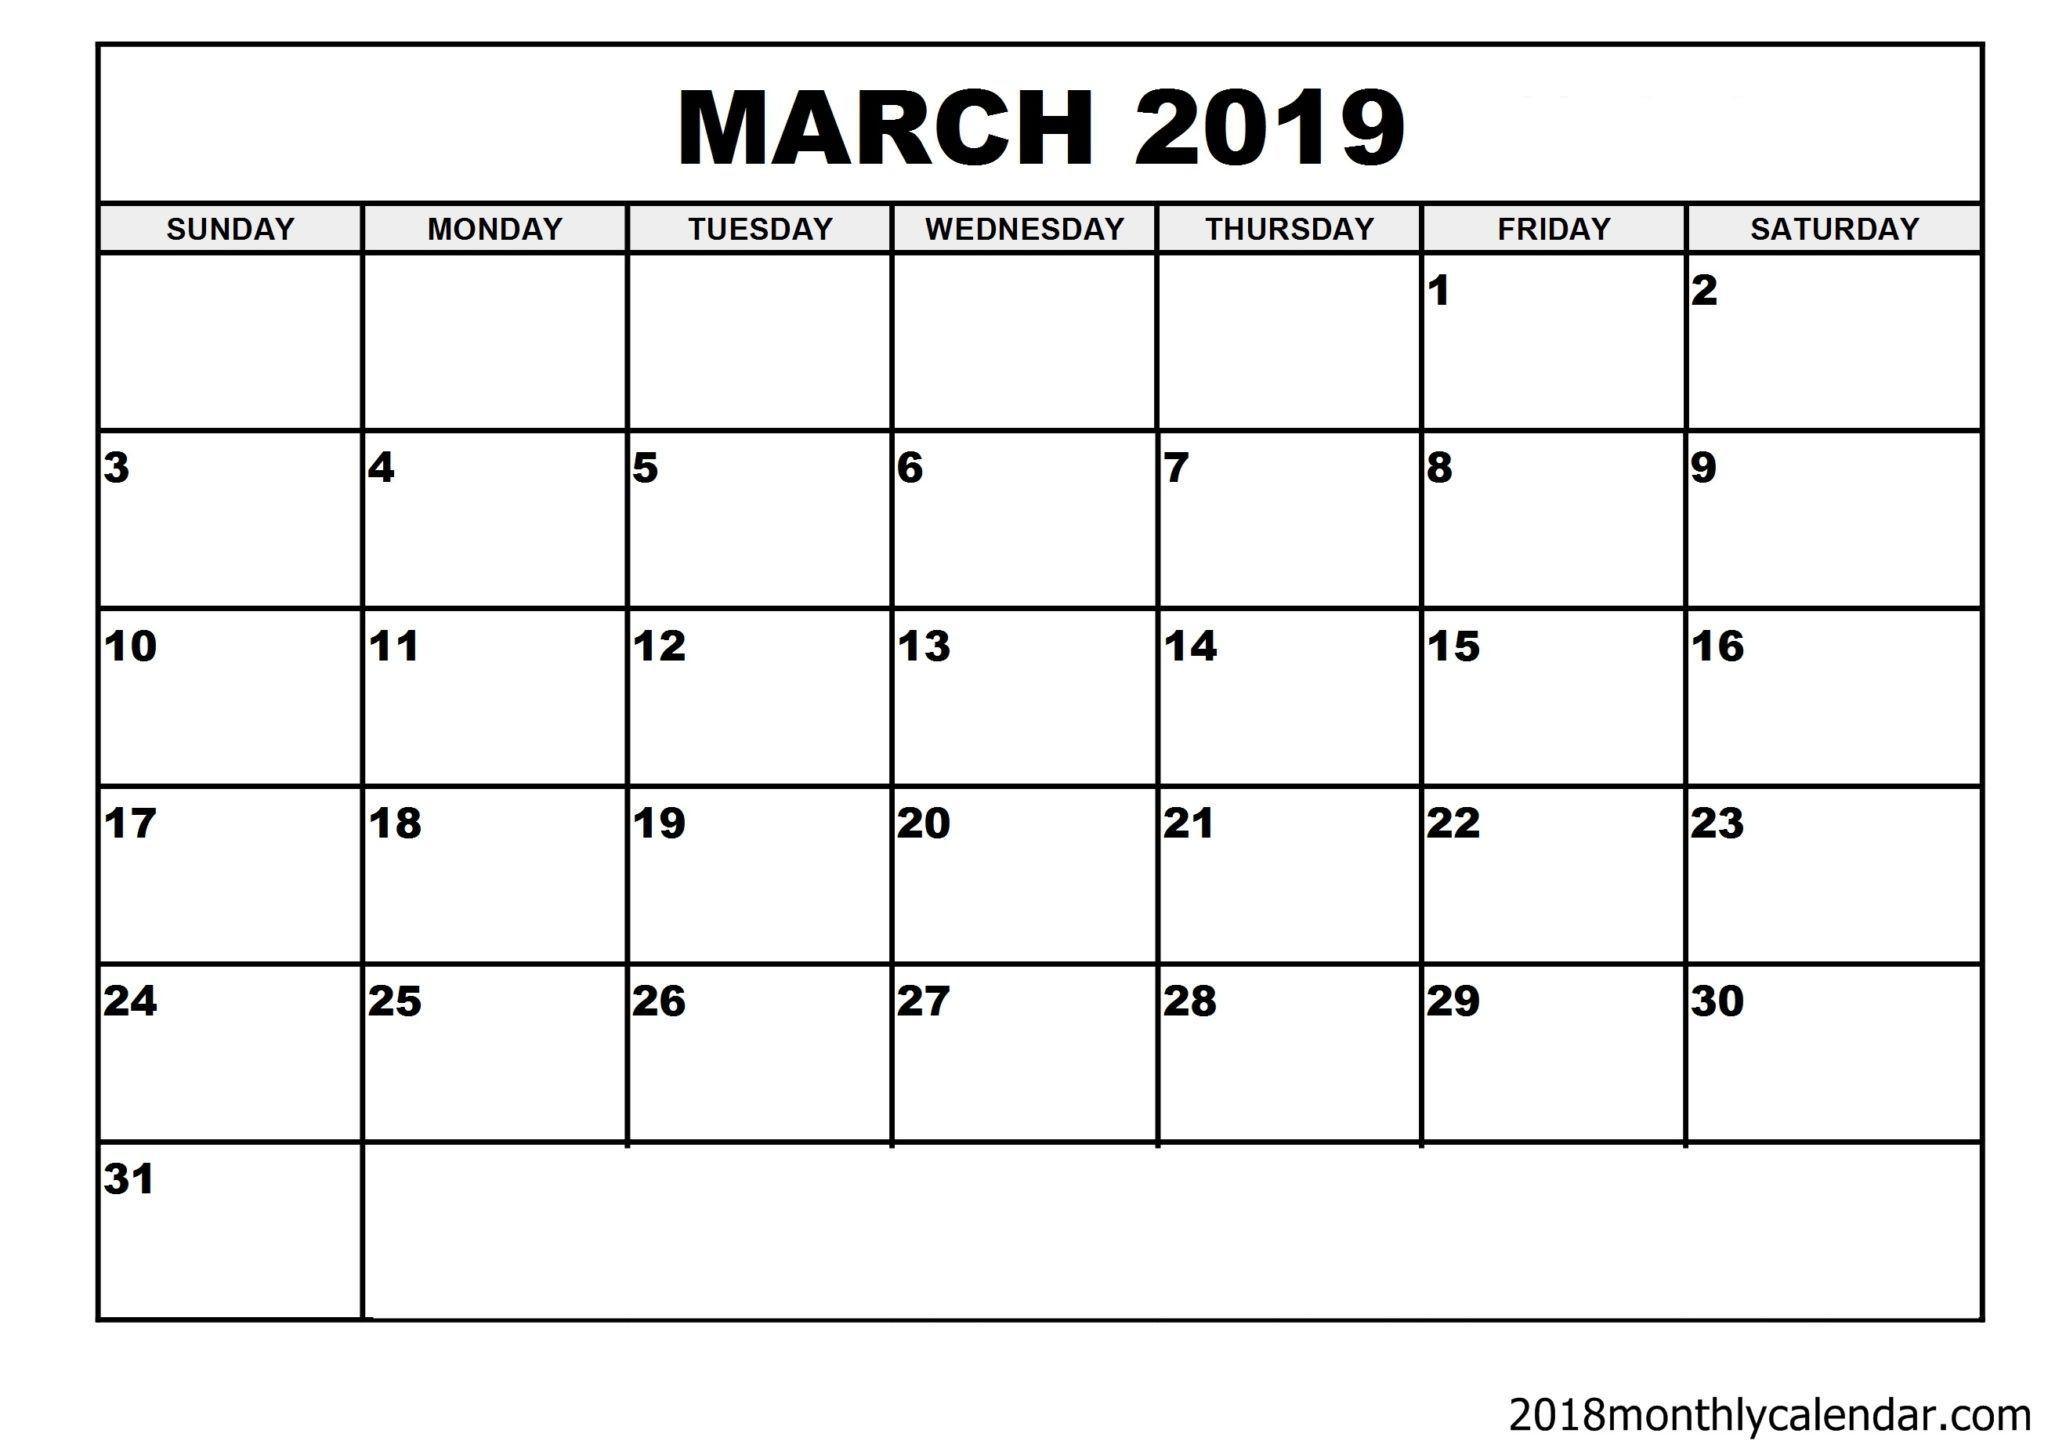 Download March 2019 Calendar – Blank Template - Editable Calendar